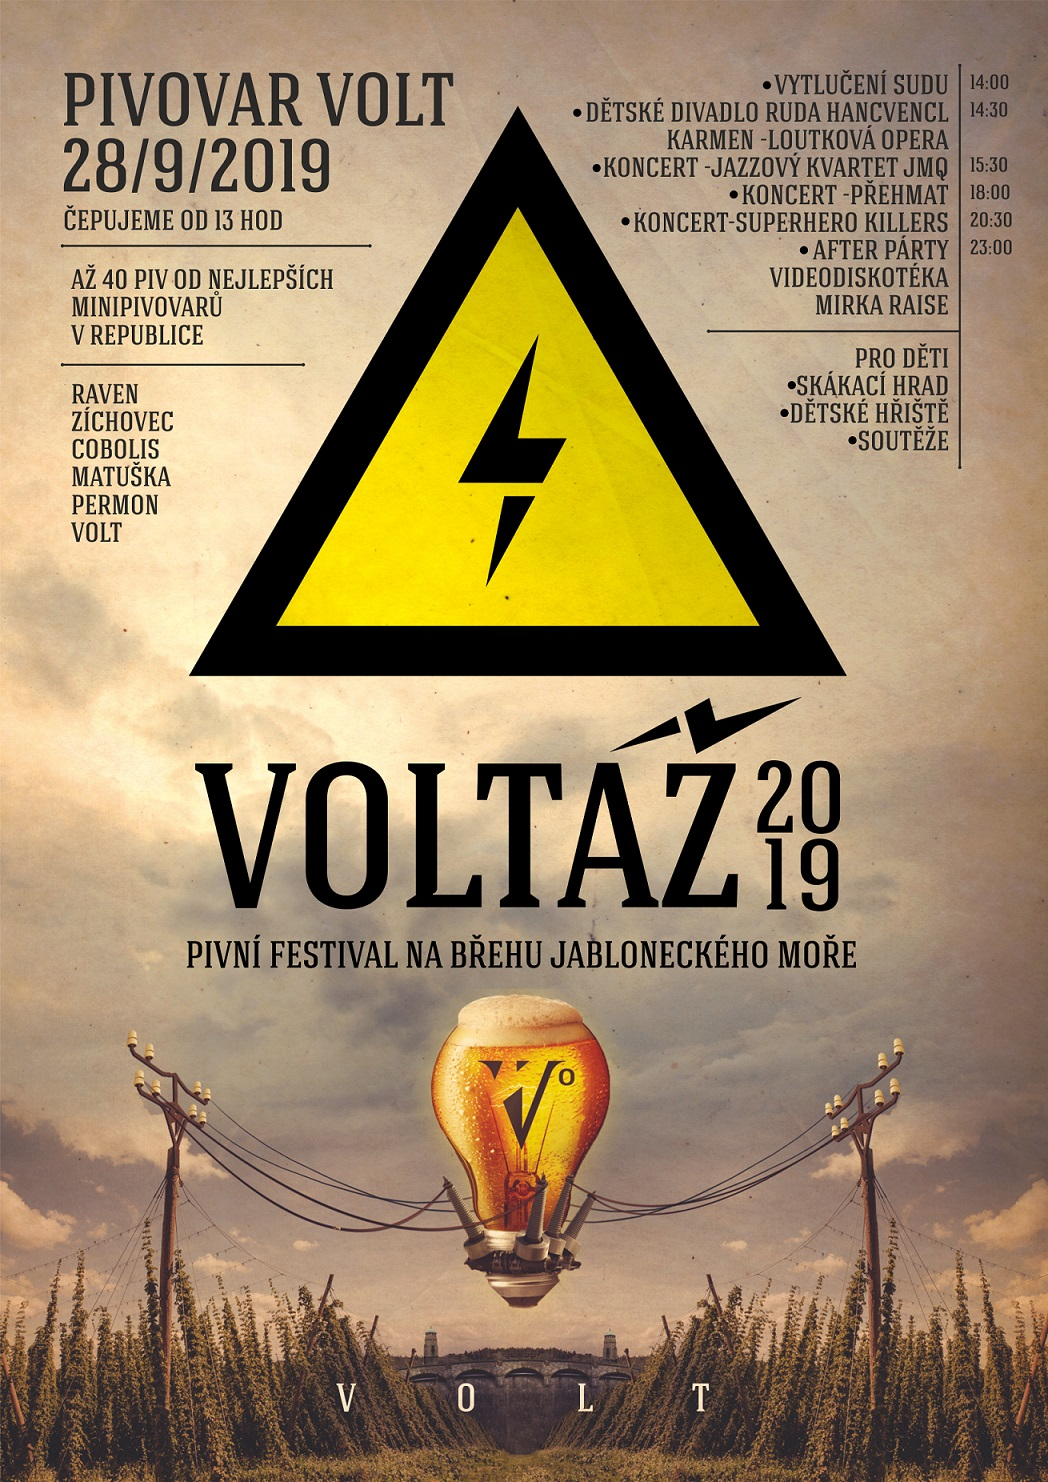 pivovari-pivovary-pivni-akce-pivni-festival-voltaz-2019